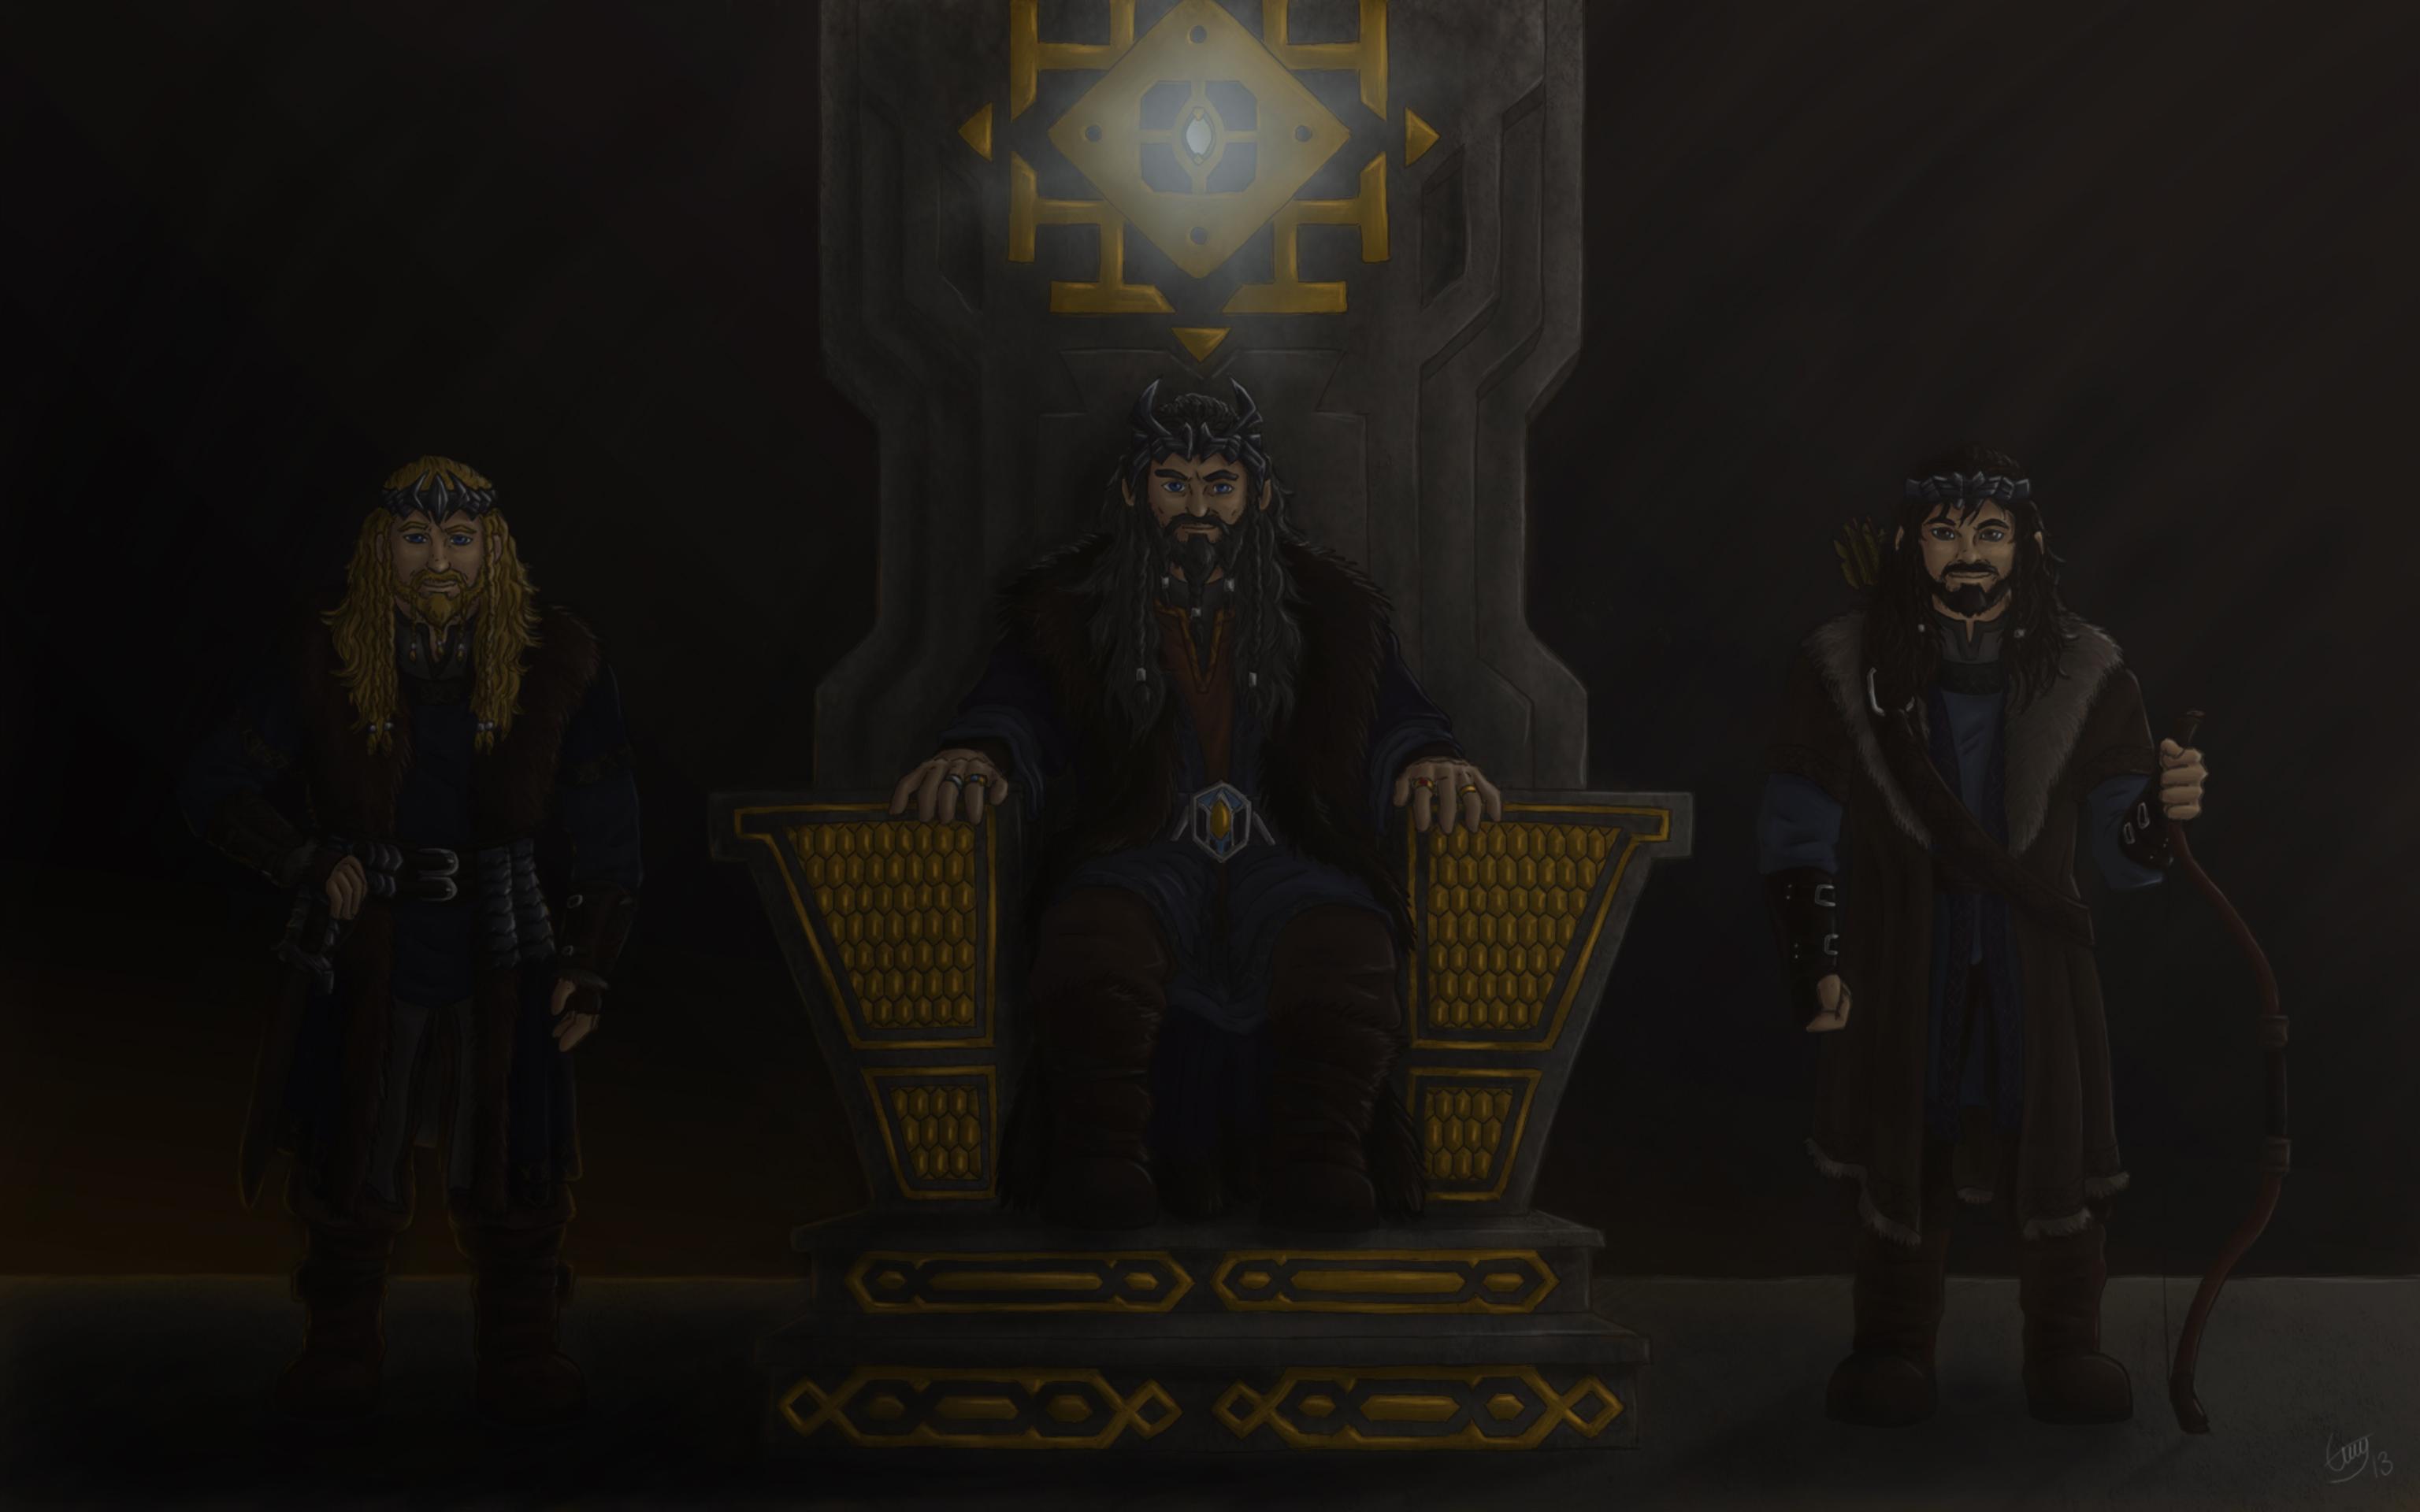 Erebor Wallpaper True kings of erebor by erry 3072x1920